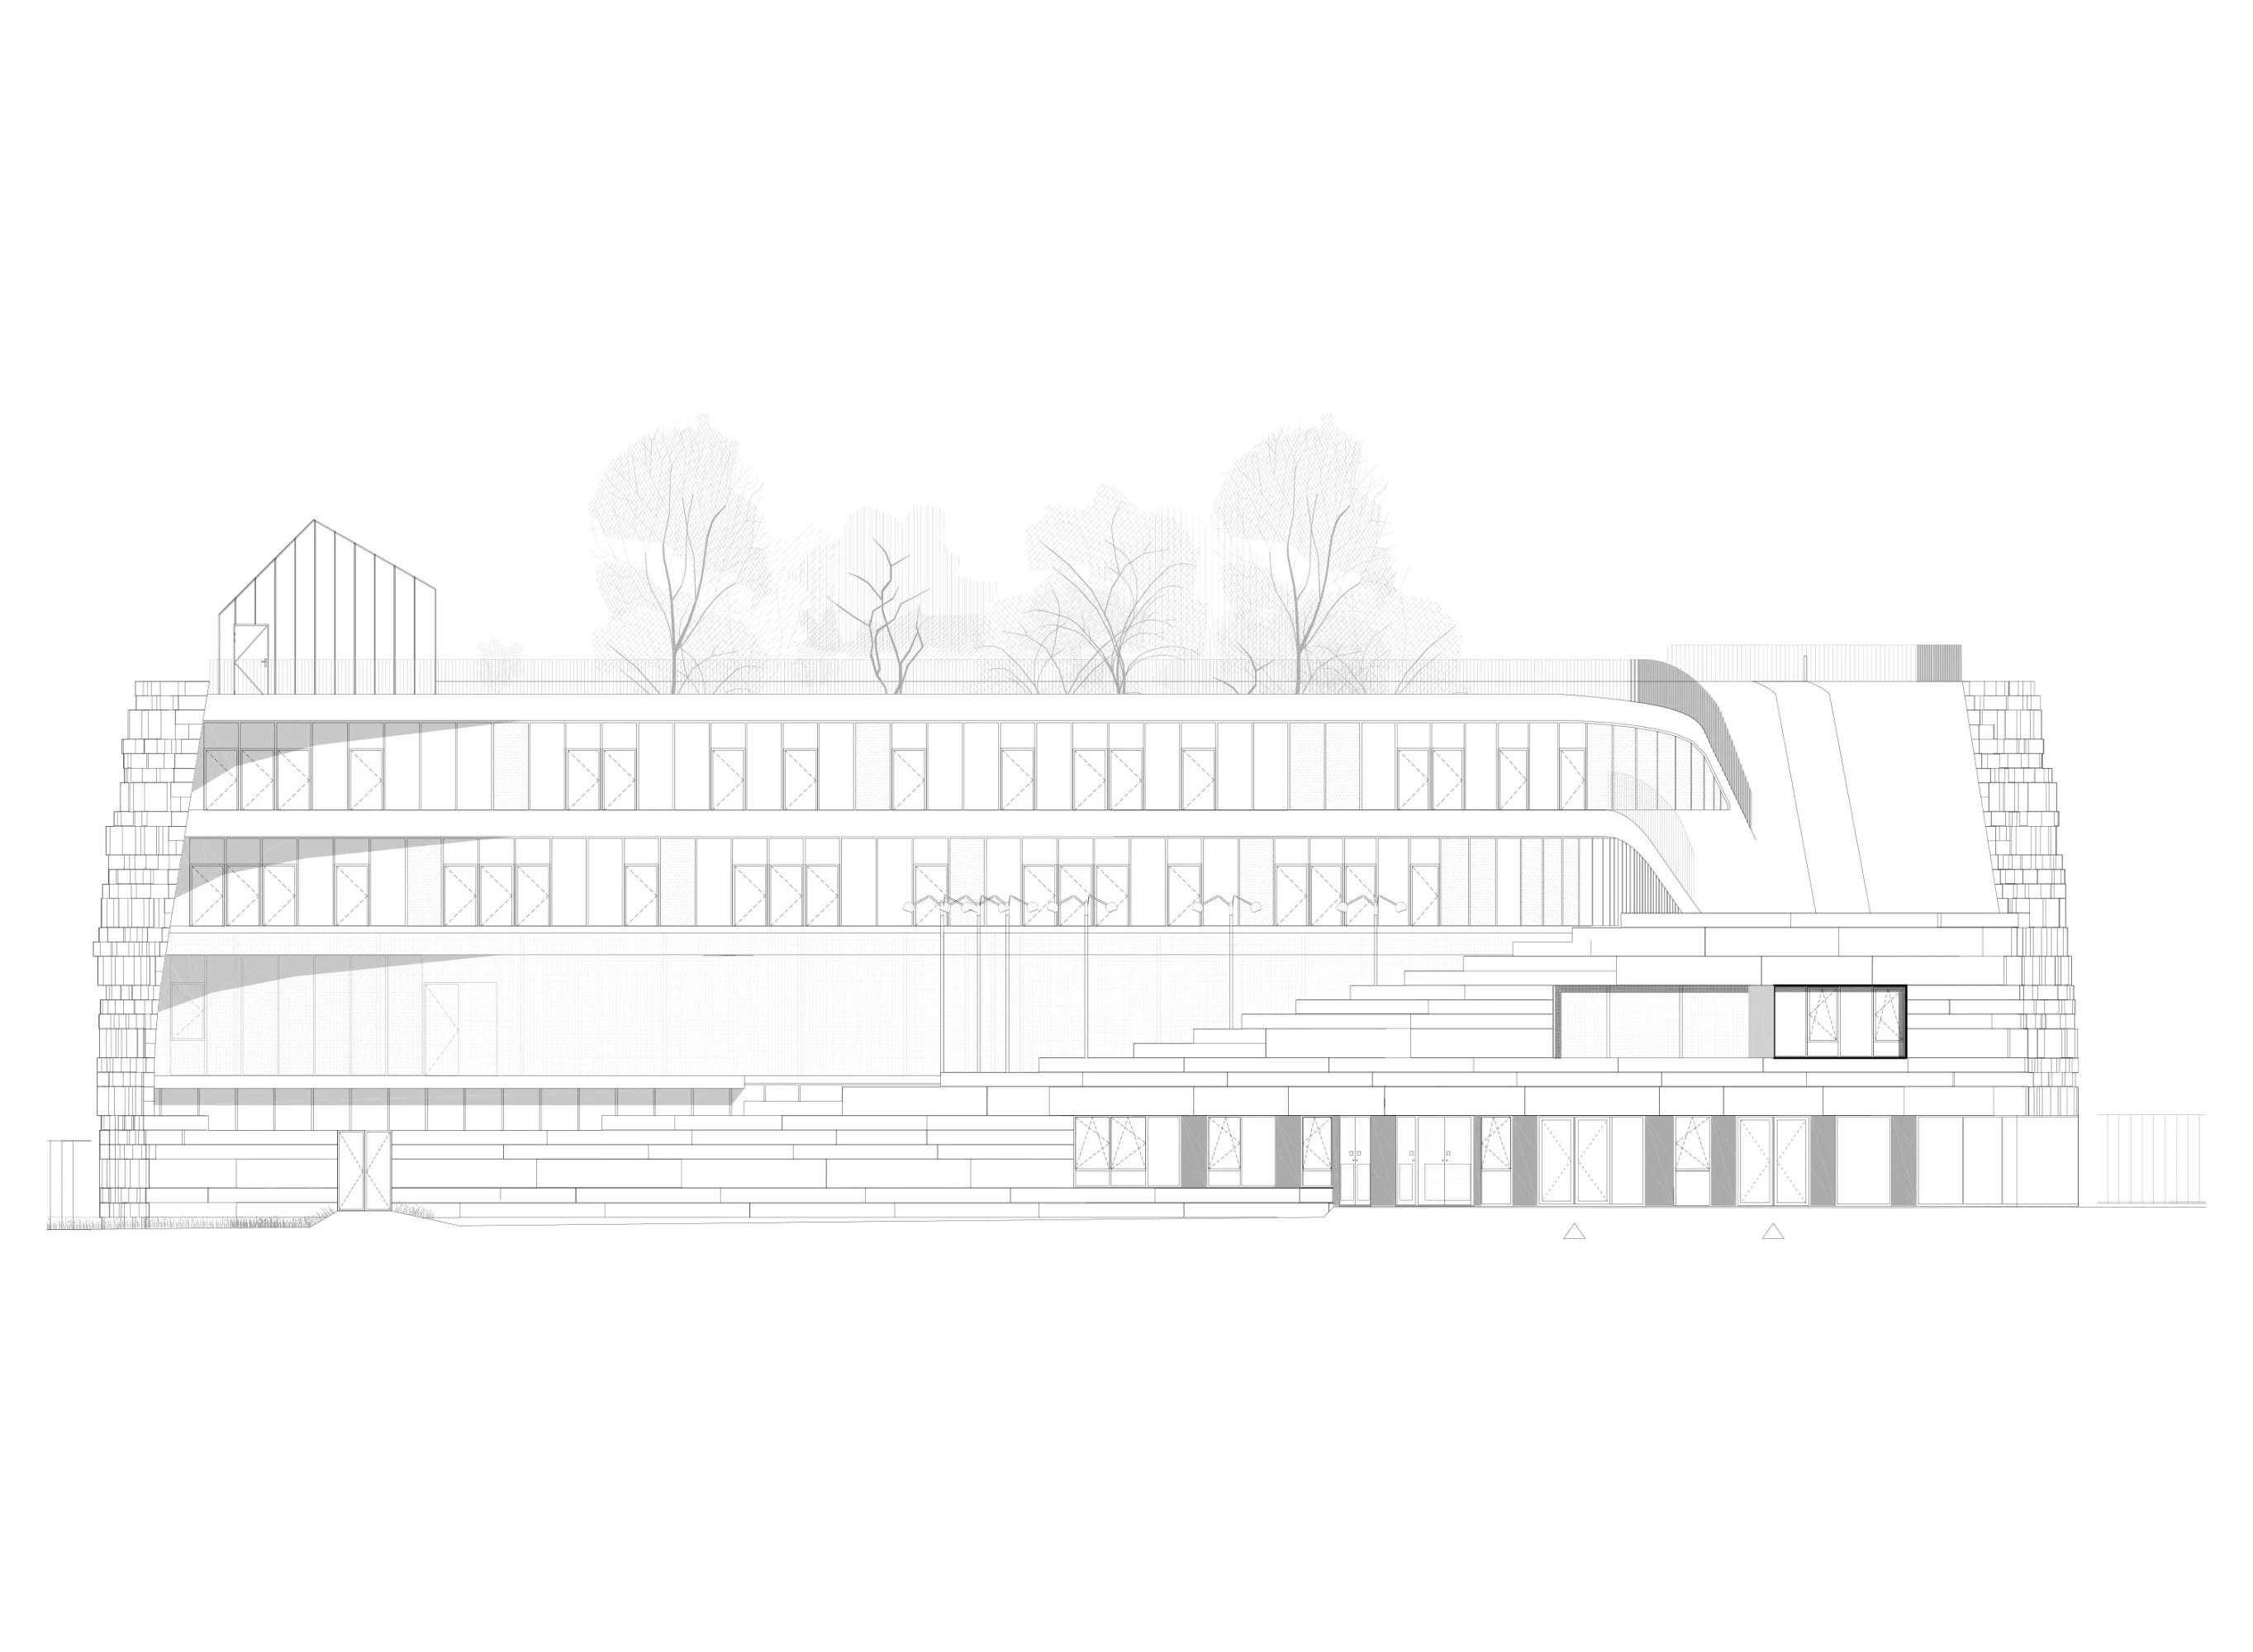 chartier dalix architectes · Primary School for Sciences